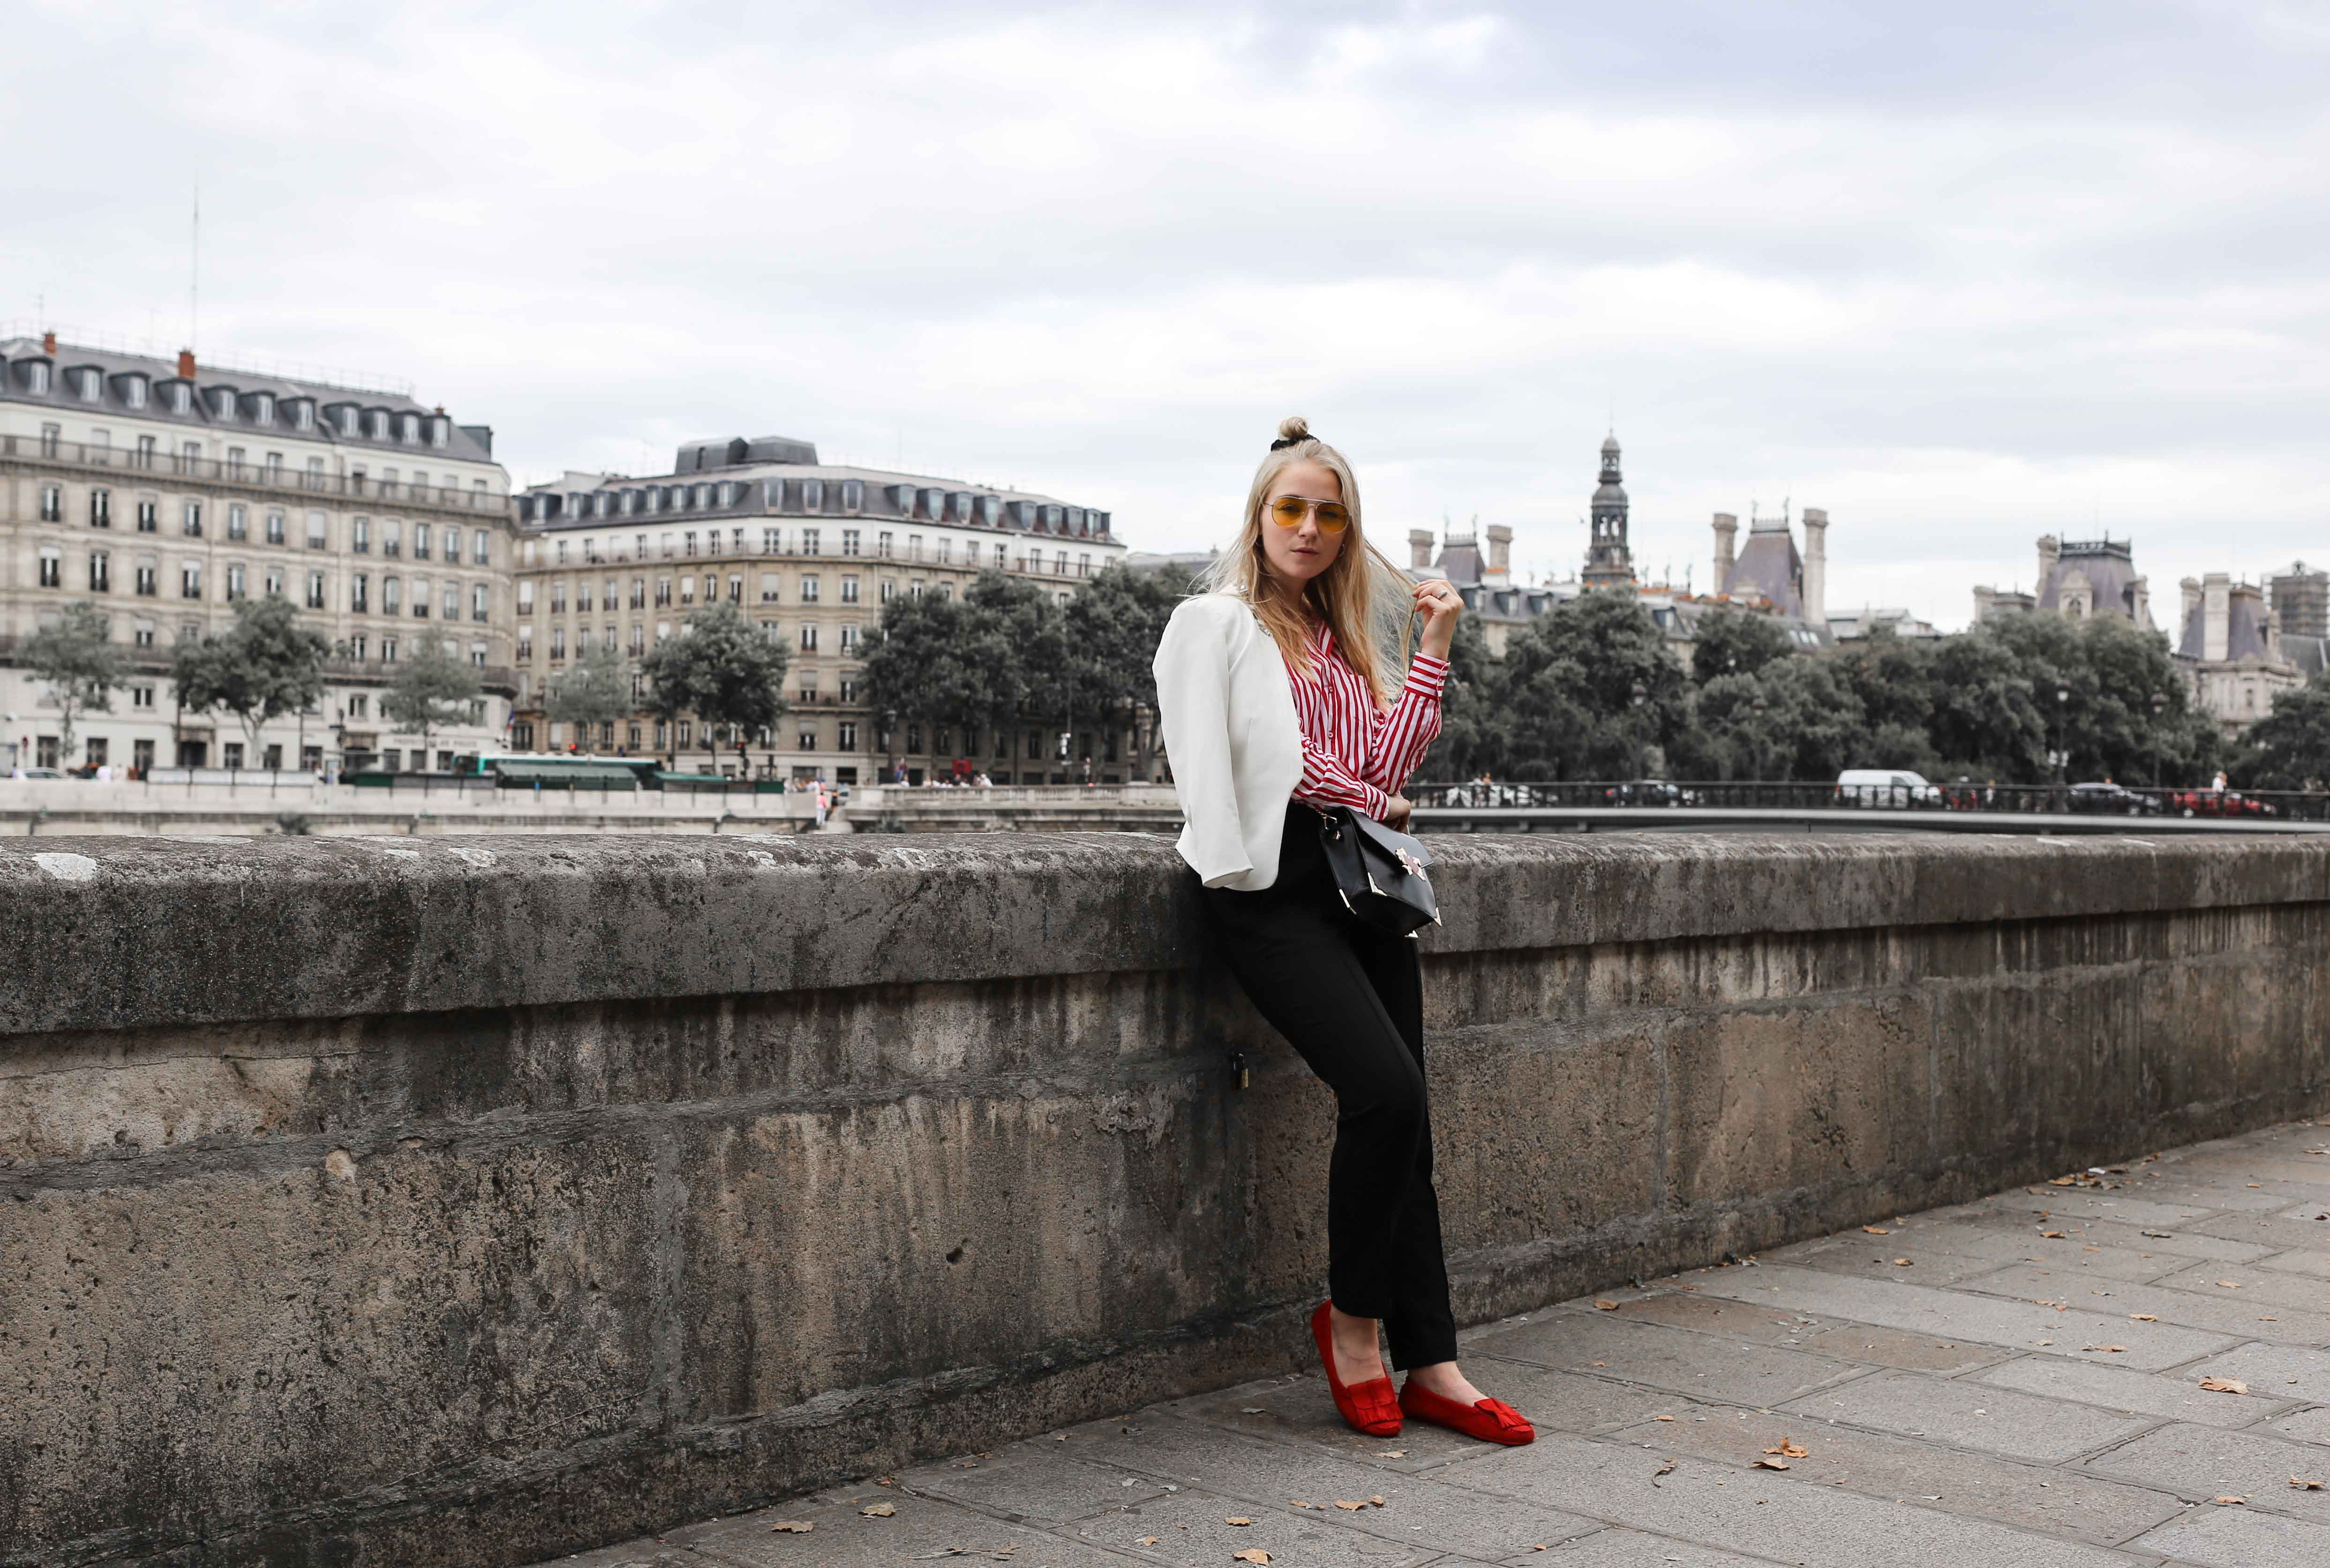 rote-mokassins-streifenbluse-weißer-blazer-paris-modeblog-fashionblog-fashion-blog_1410